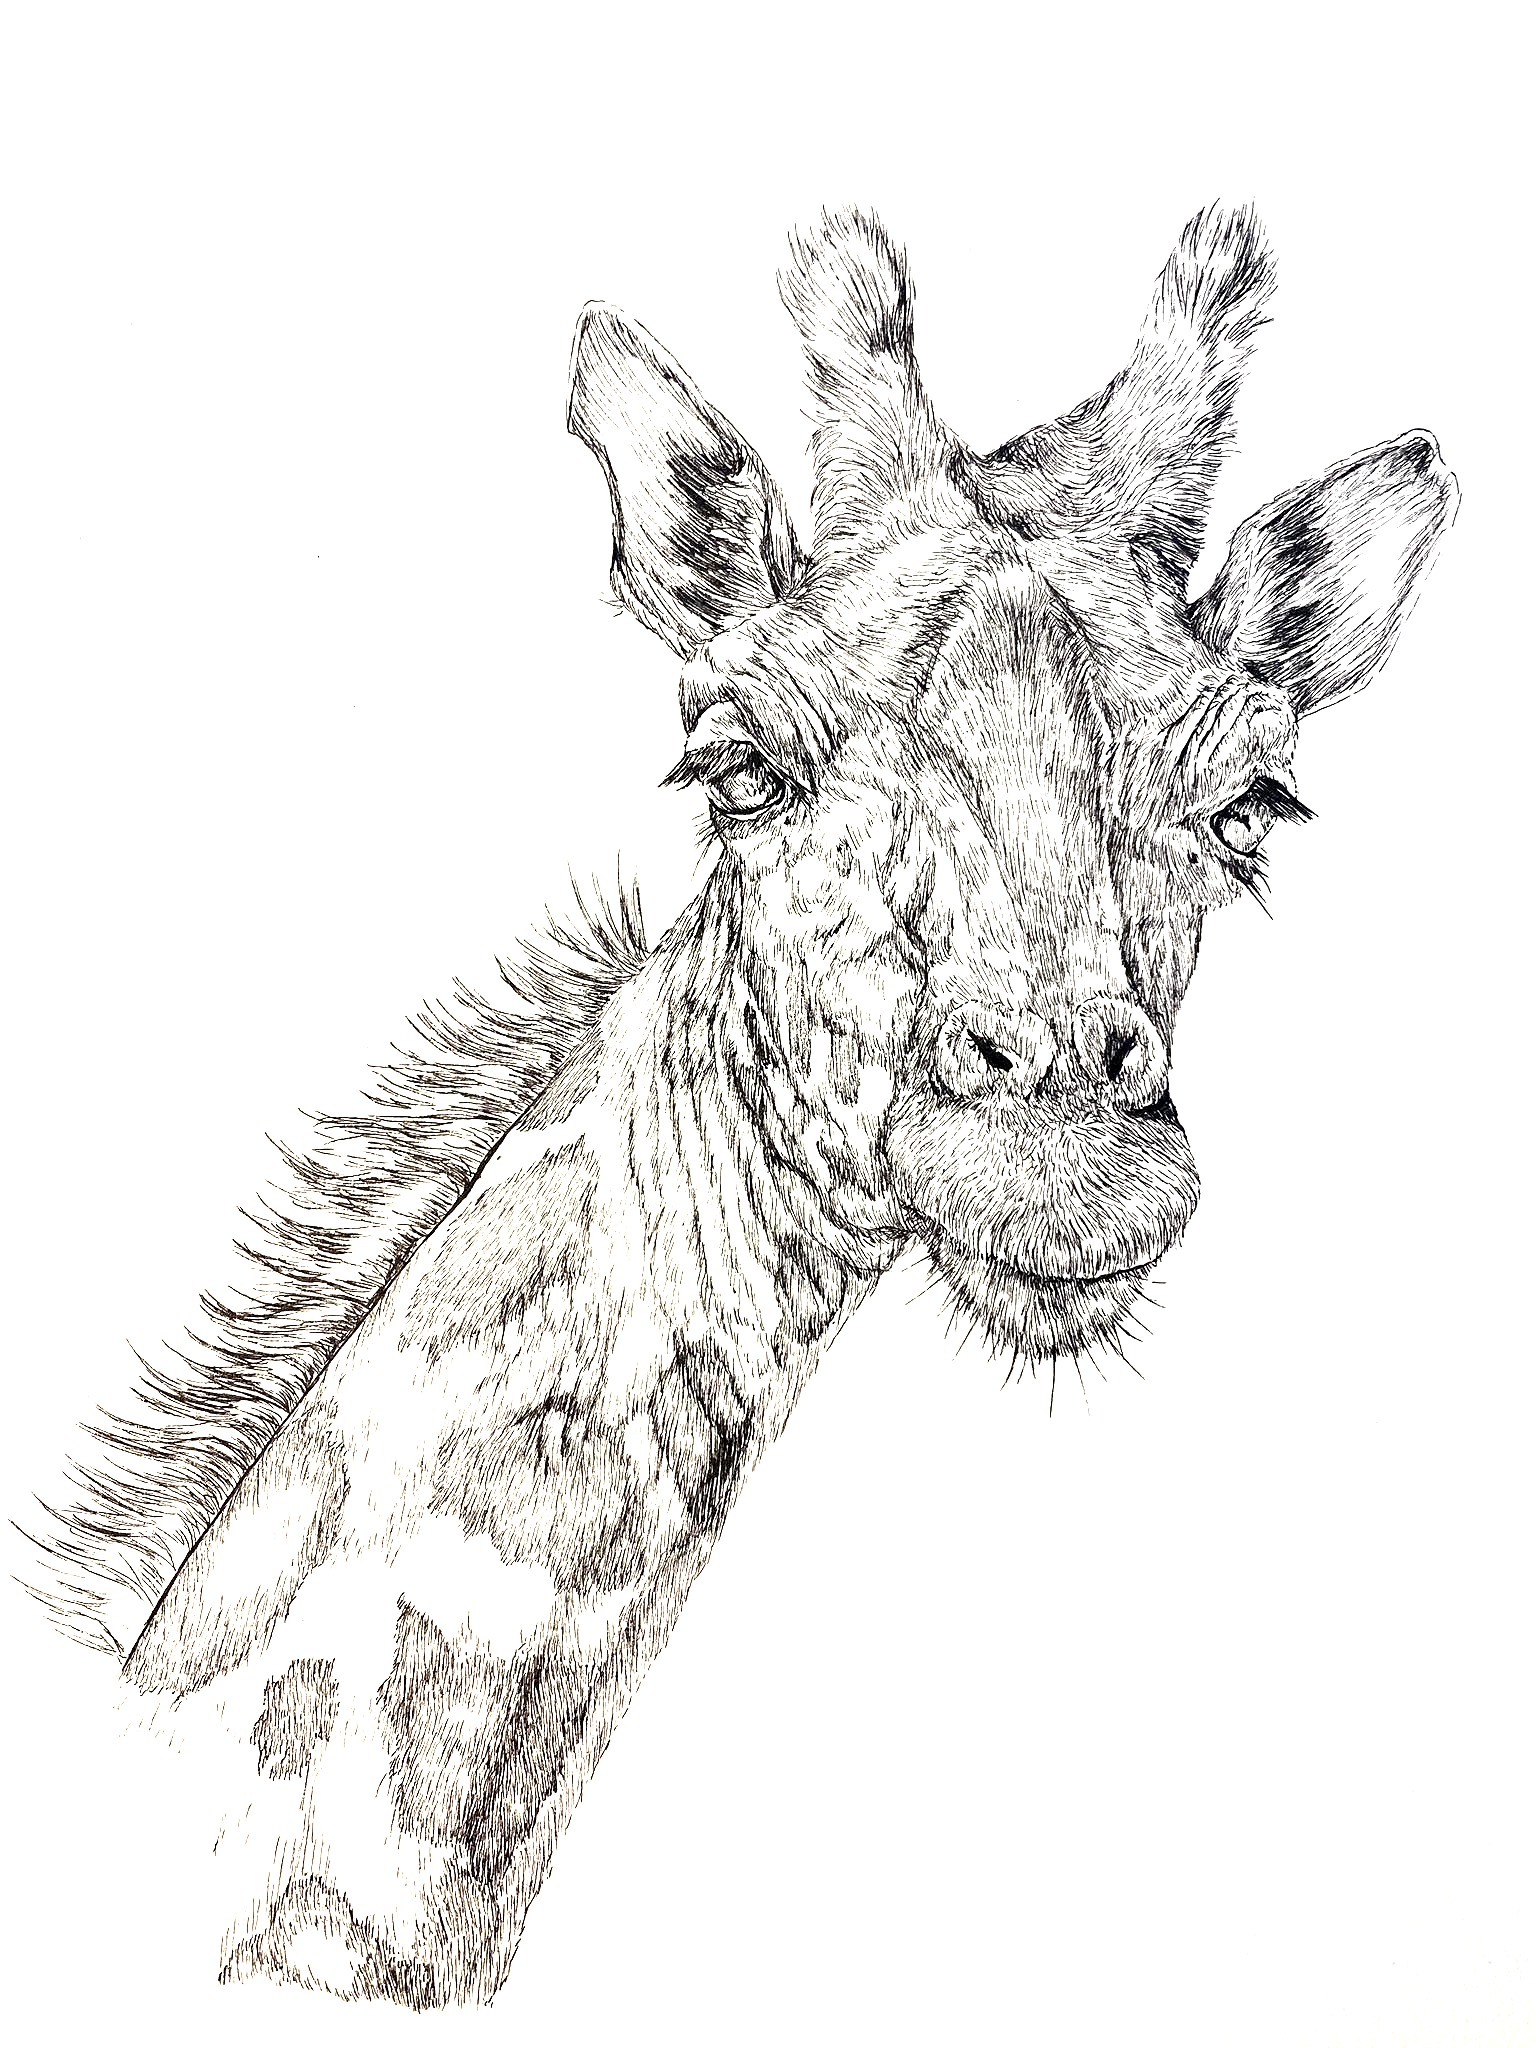 Giraffe Commission